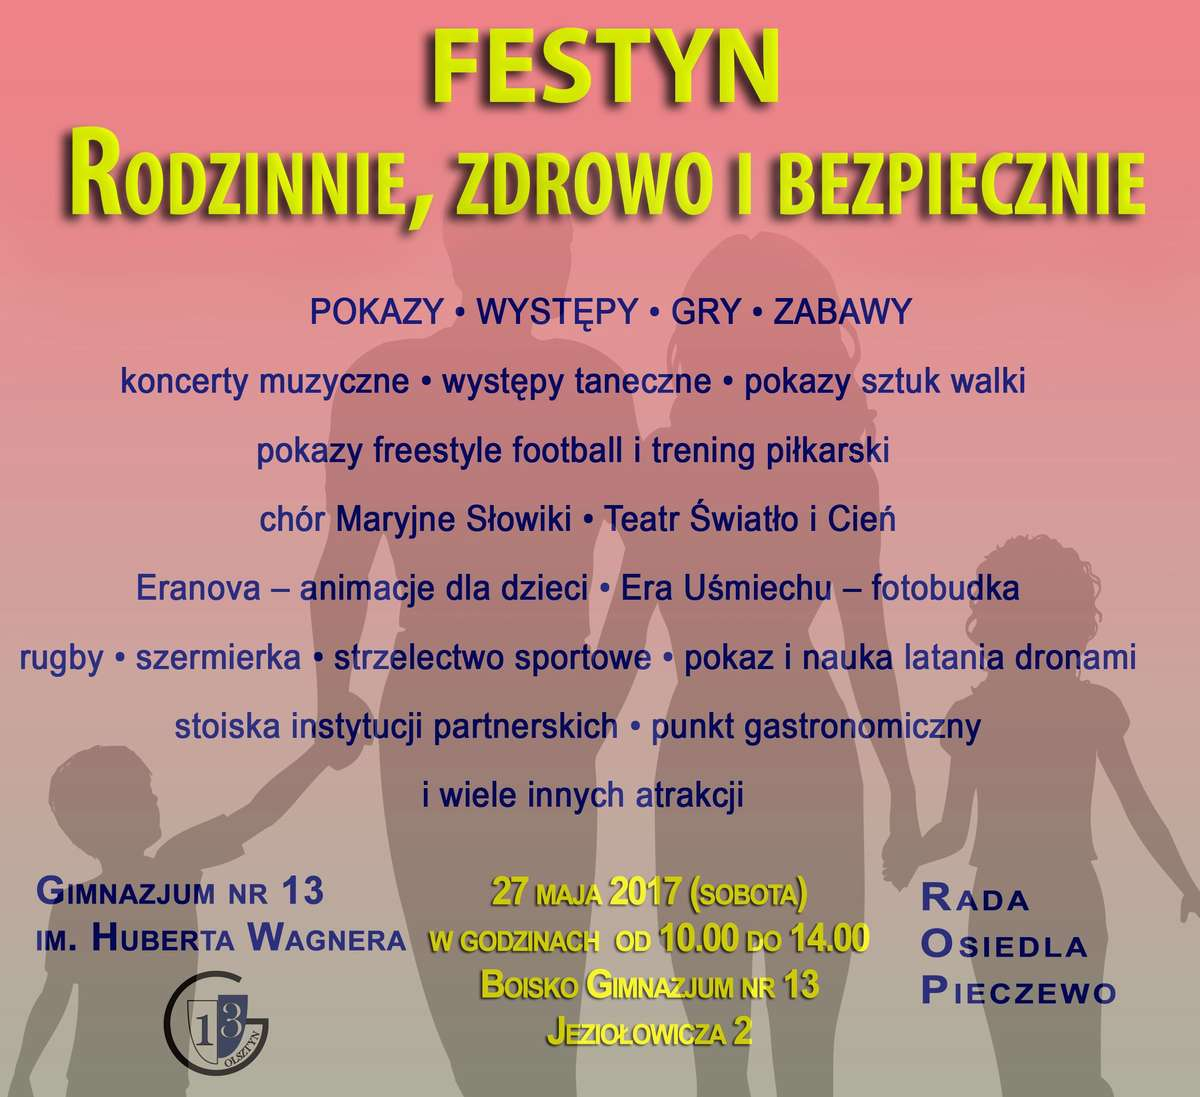 Festyn na Dni Rodziny - full image